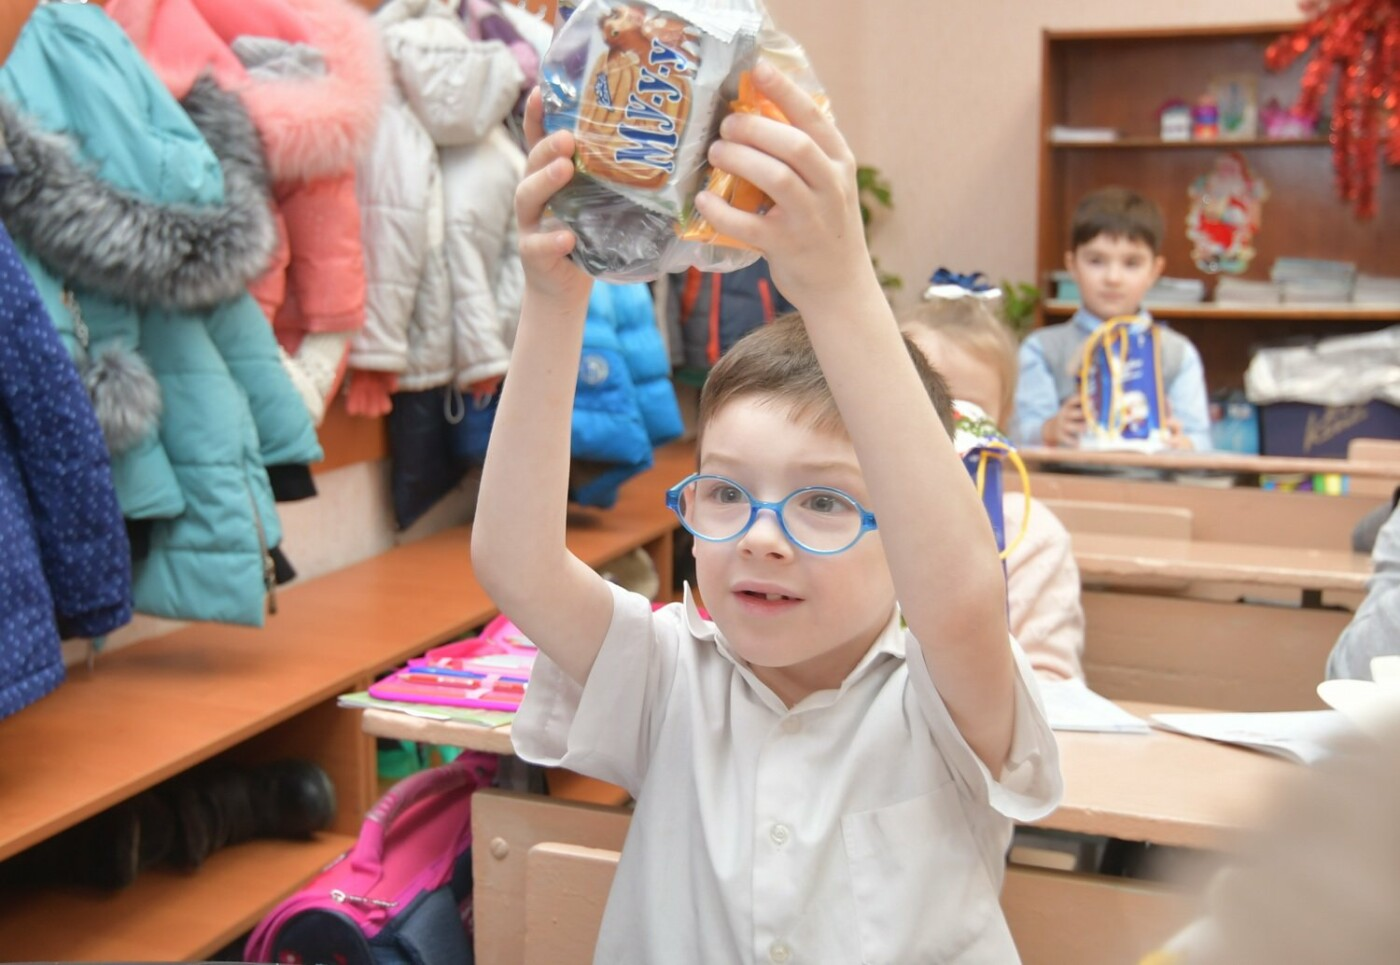 54000 детей Донбасса получили от Бориса Колесникова новогодние подарки, фото-3